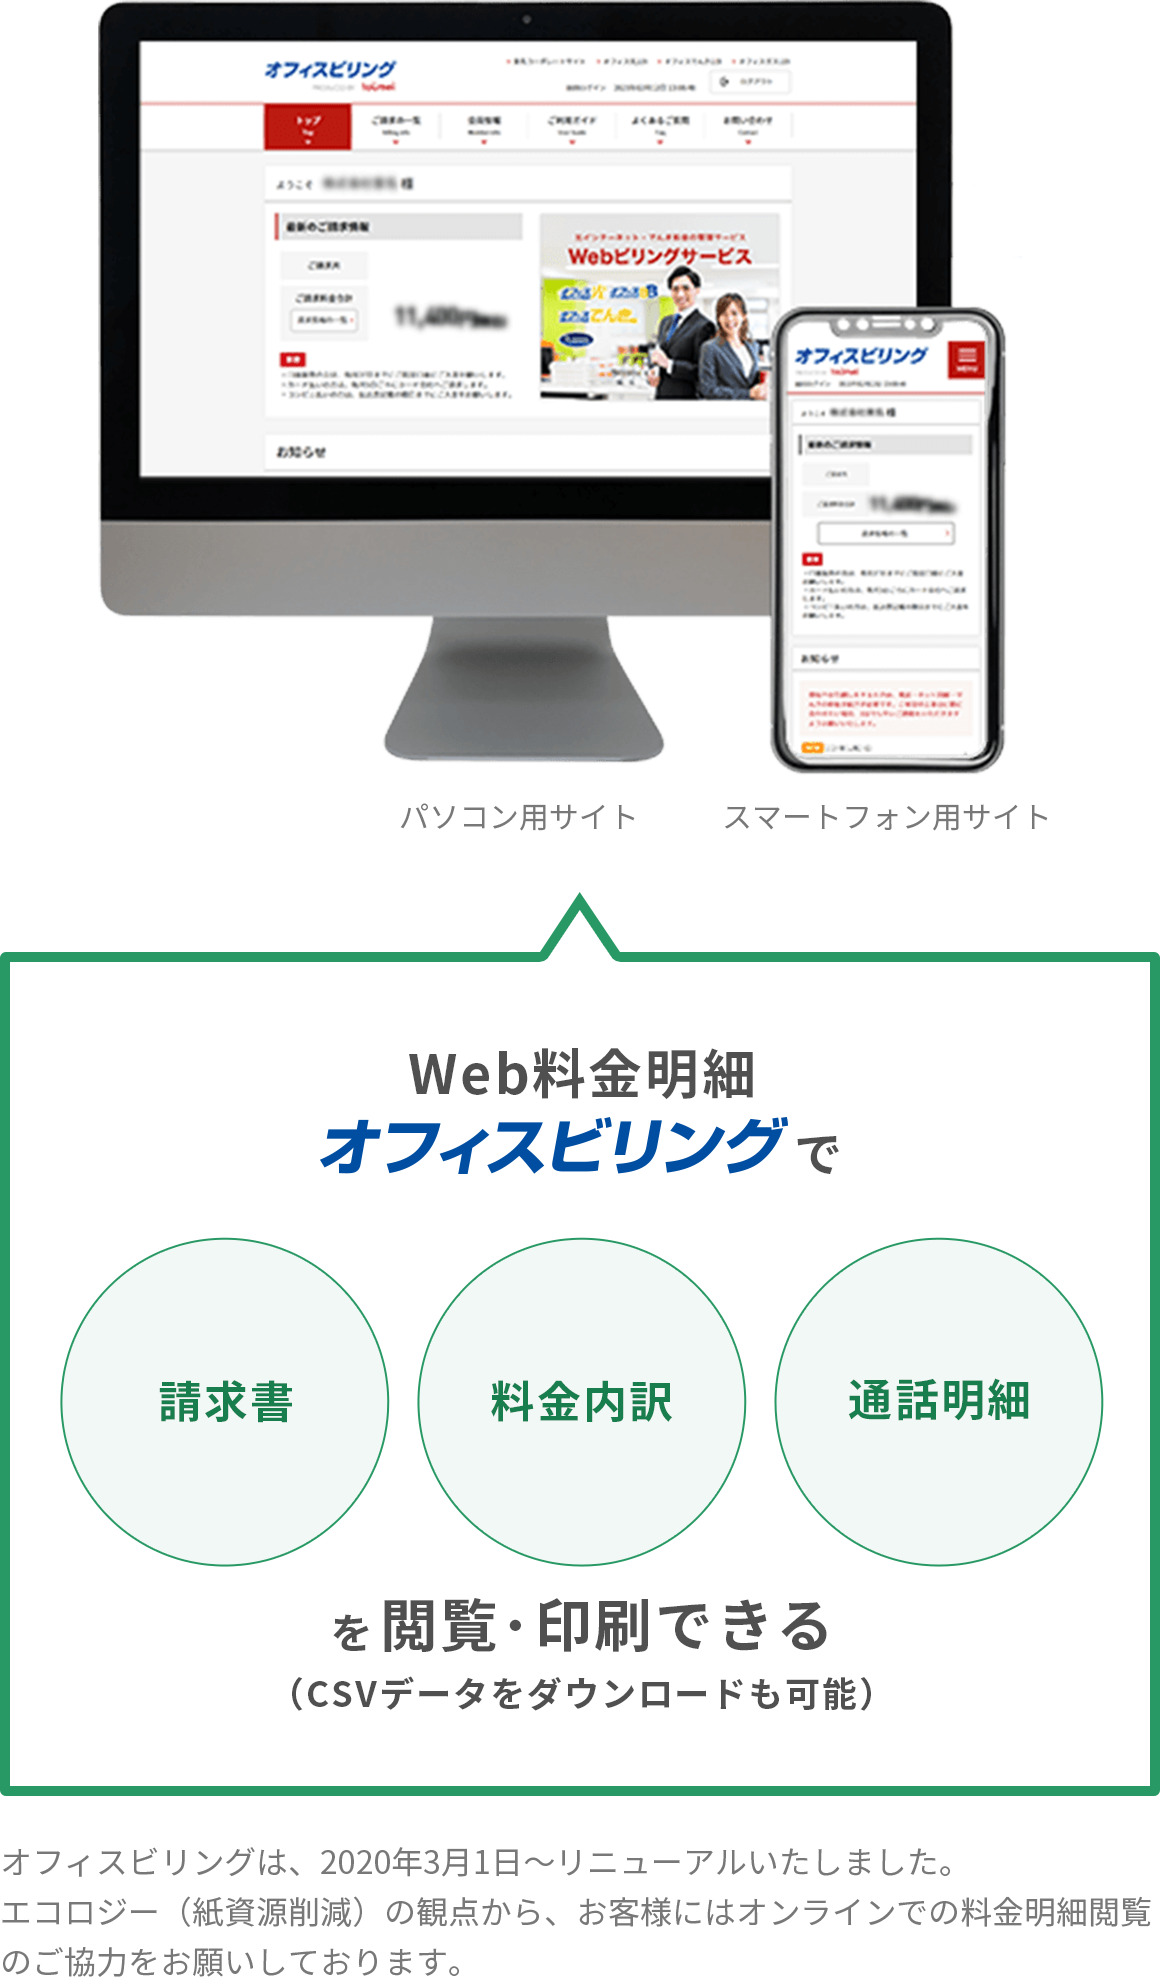 Web料金明細オフィスビリングで請求書・料金内訳・融和明細を閲覧・印刷できる